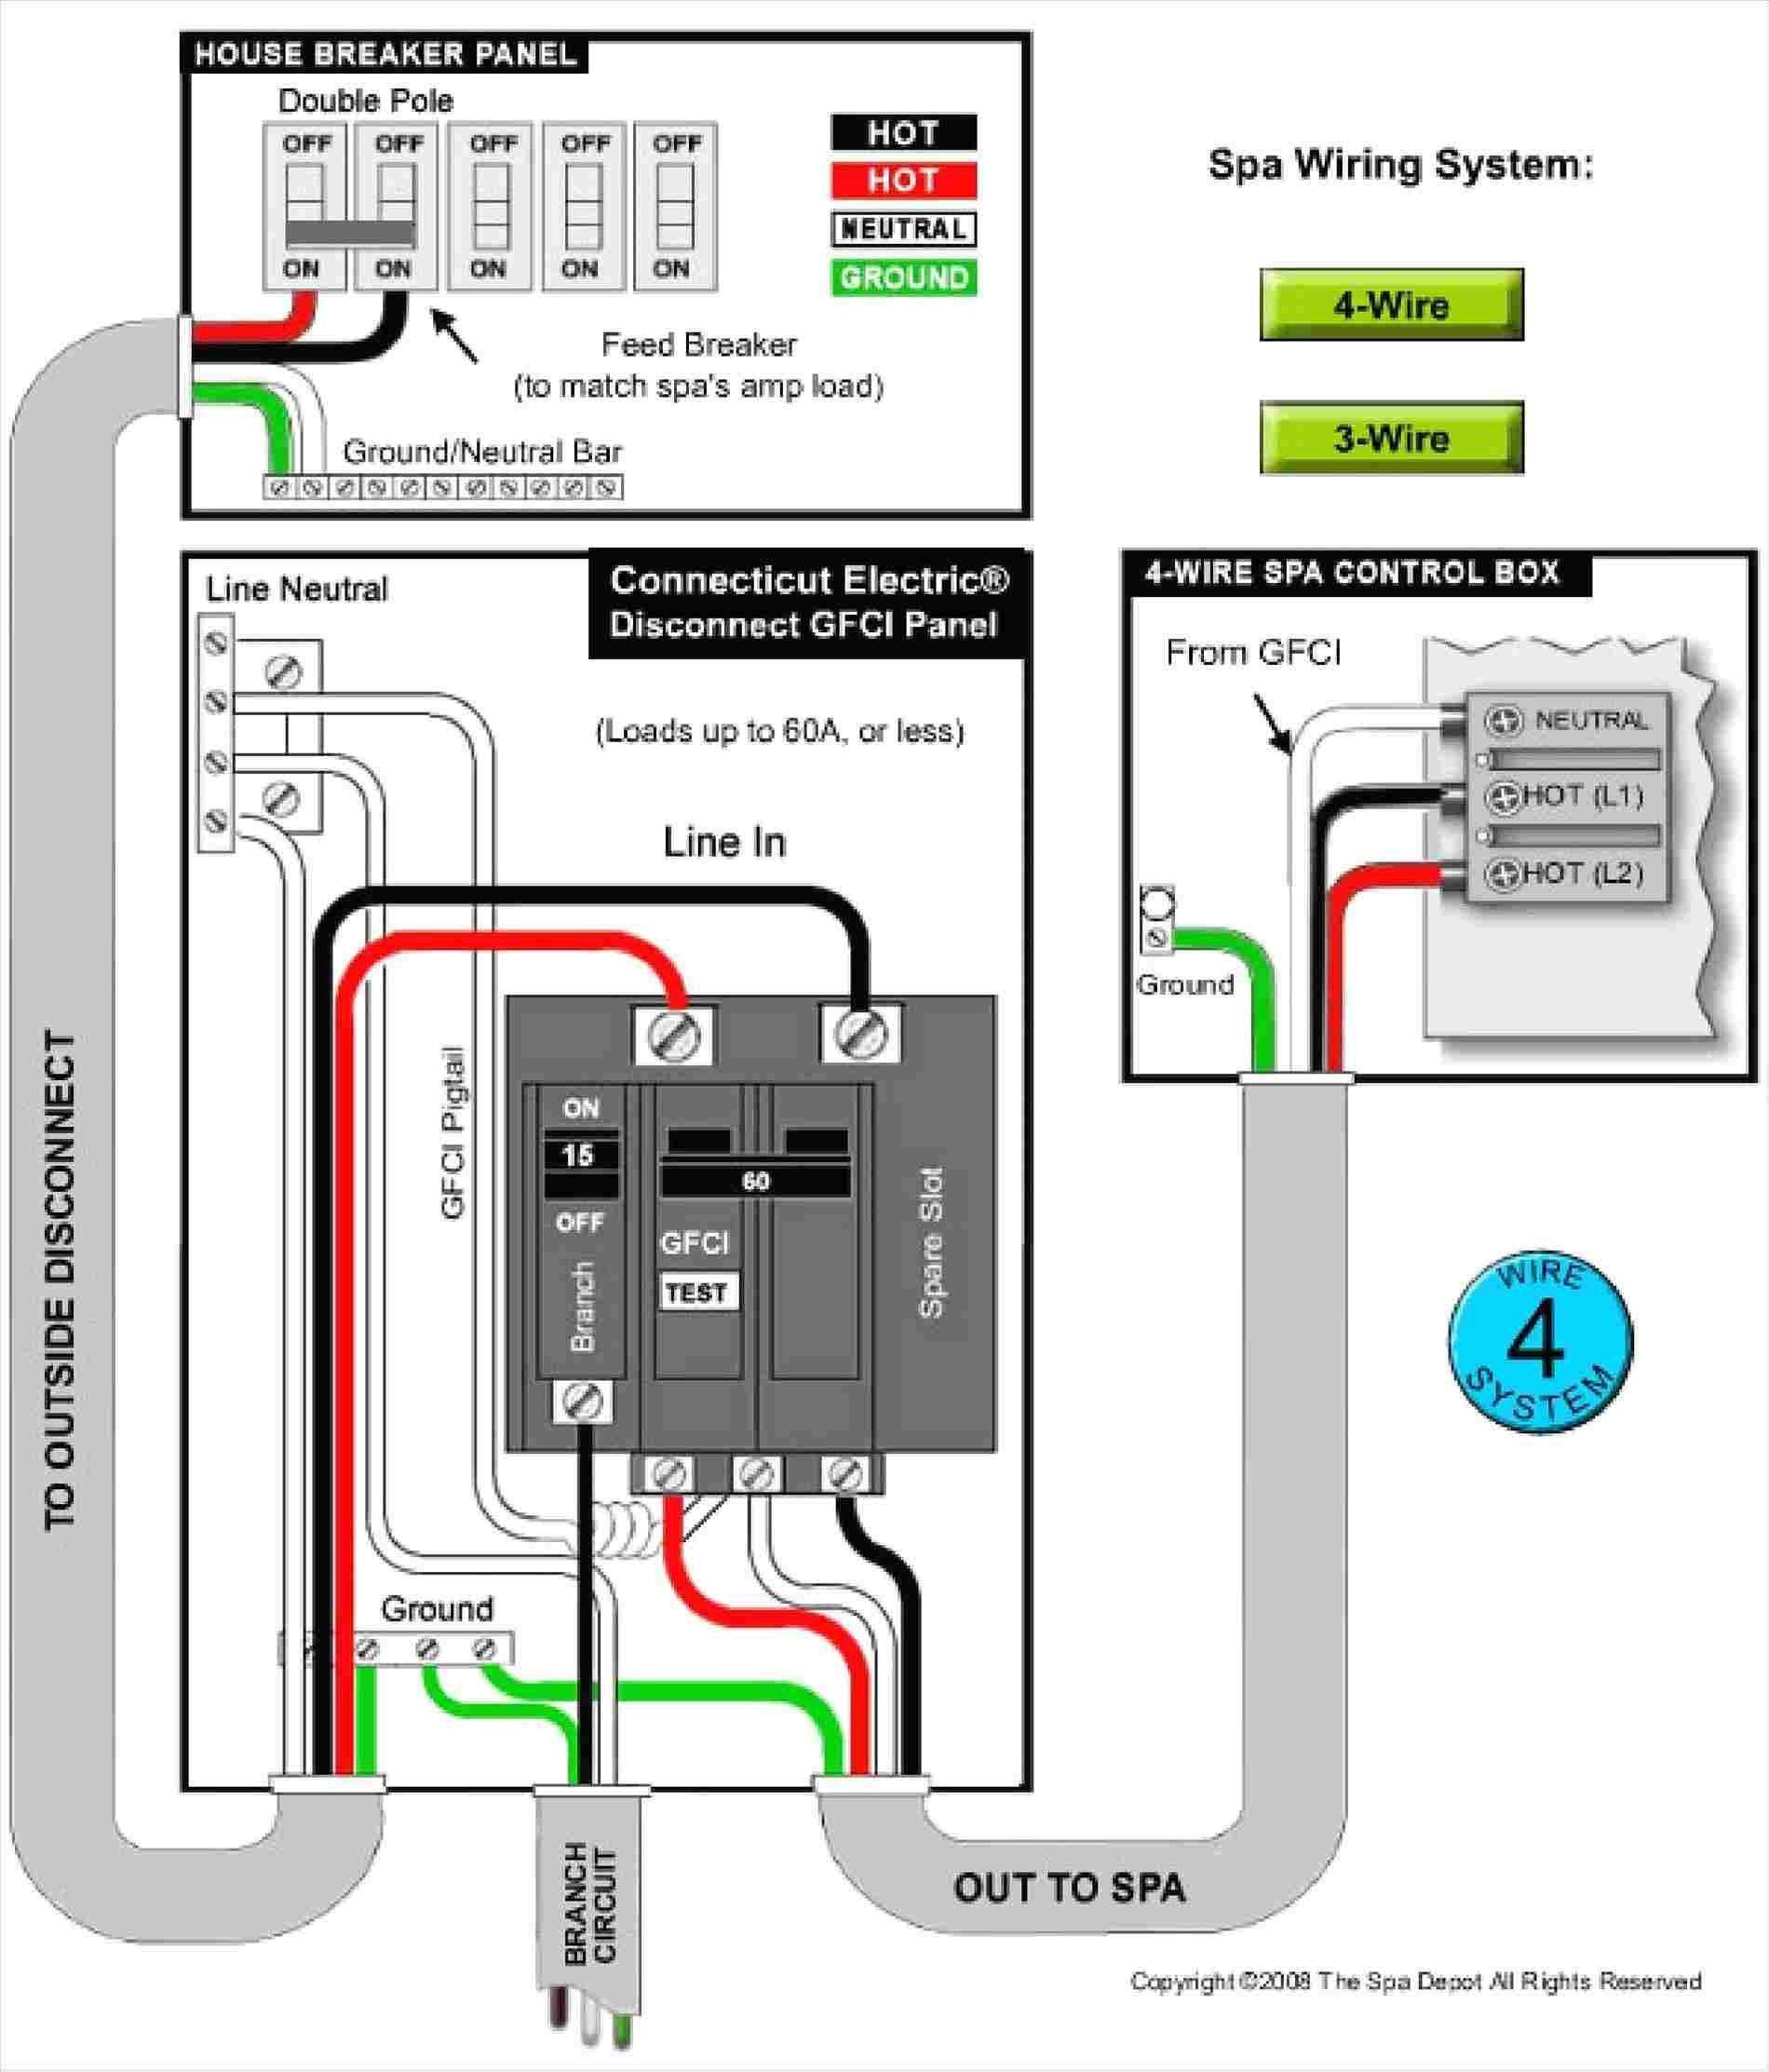 Diagram Diagramsample Diagramtemplate Wiringdiagram Diagramchart Worksheet Worksheettemplate Check More At Gfci Hot Tub Delivery Electrical Panel Wiring